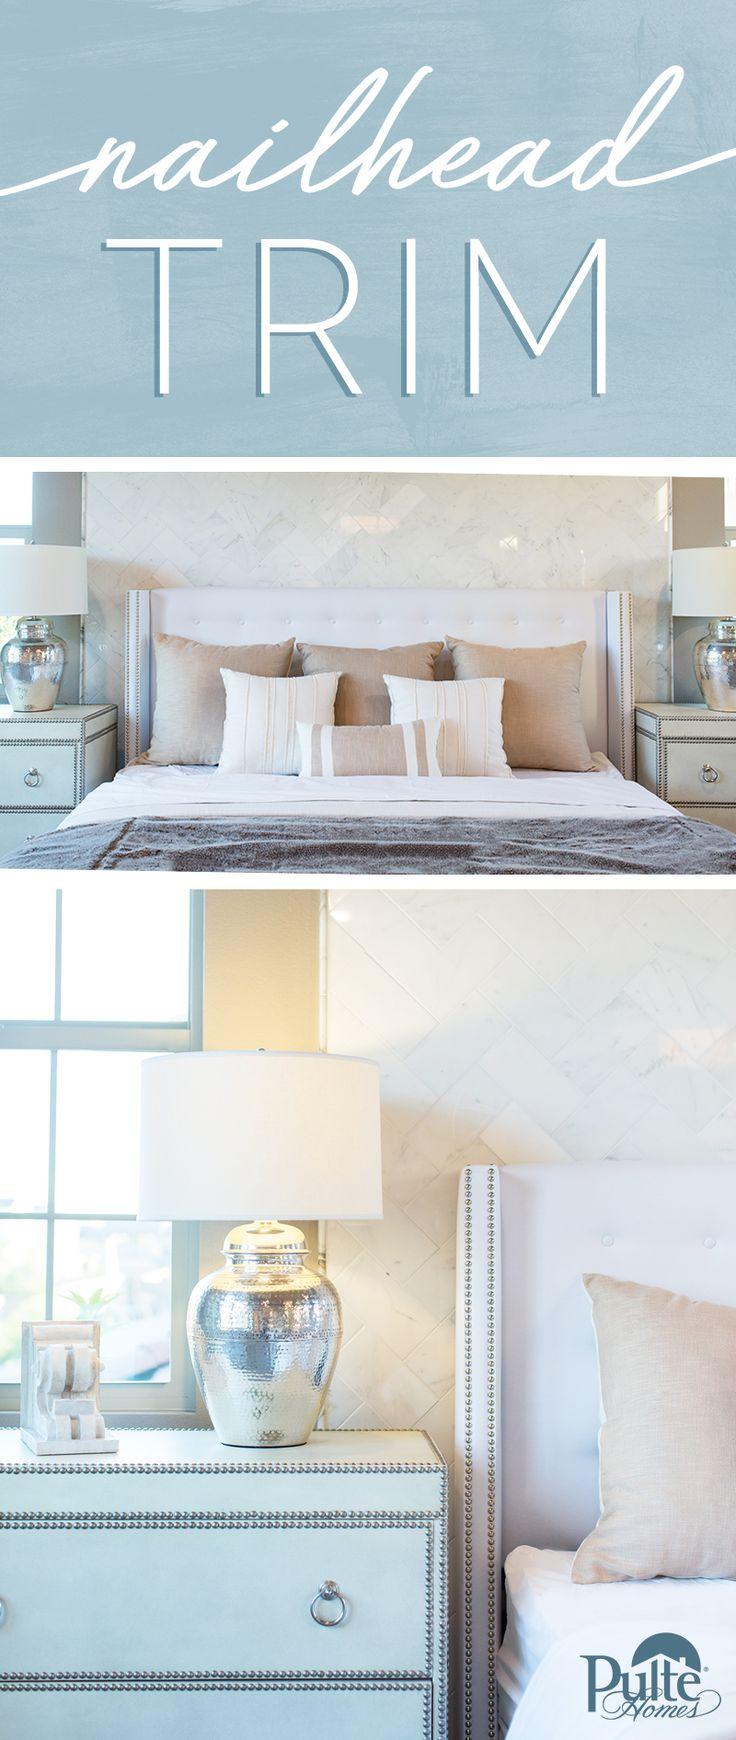 105 best Dream Bedrooms images on Pinterest | Pulte homes, Bedroom ...